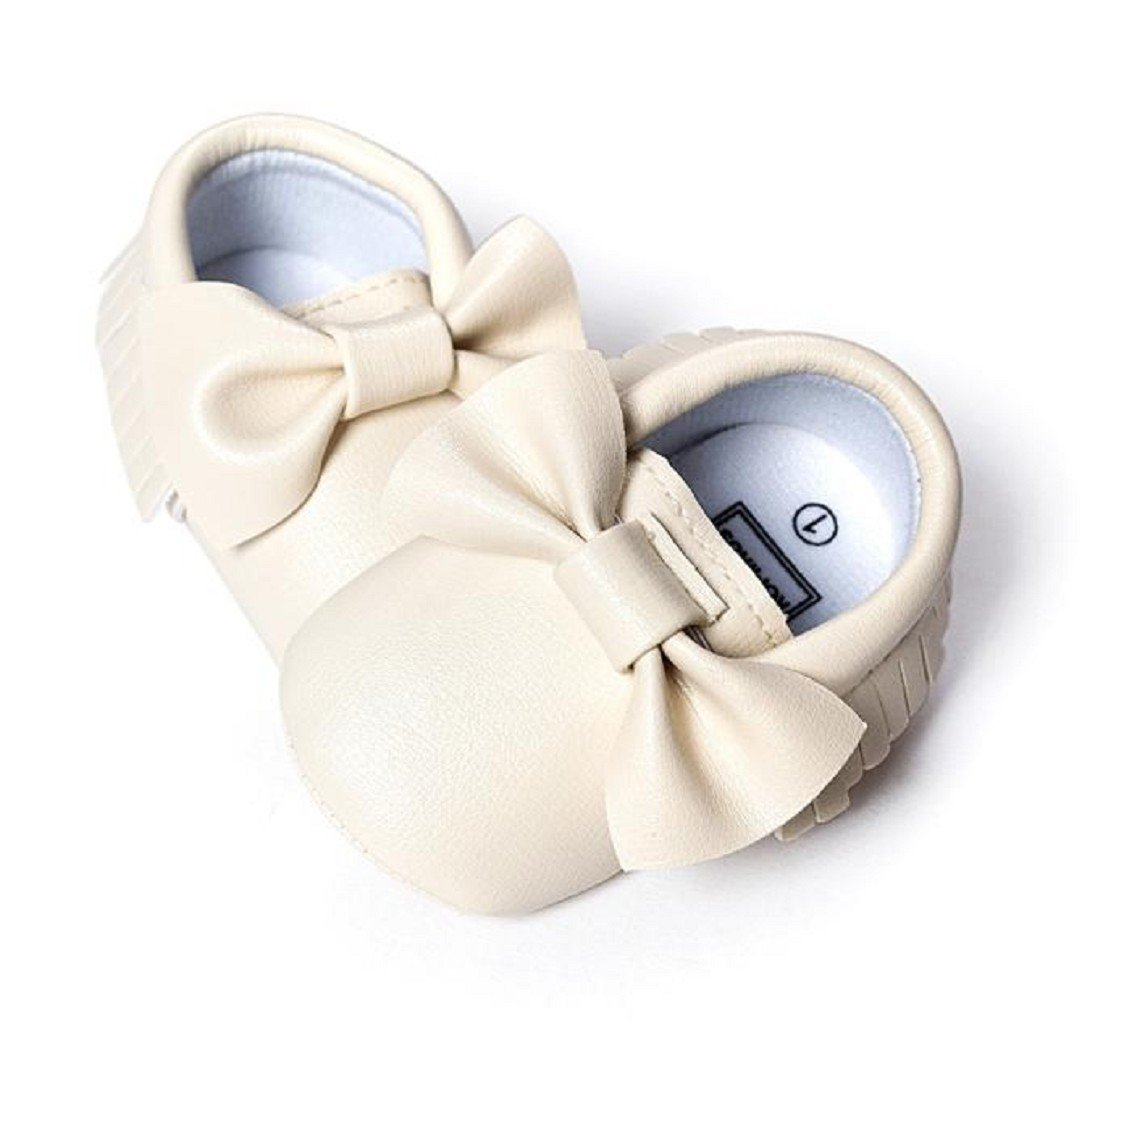 Sunfei Baby Infant Boys Girls Tassels Bowknot Crib Shoes